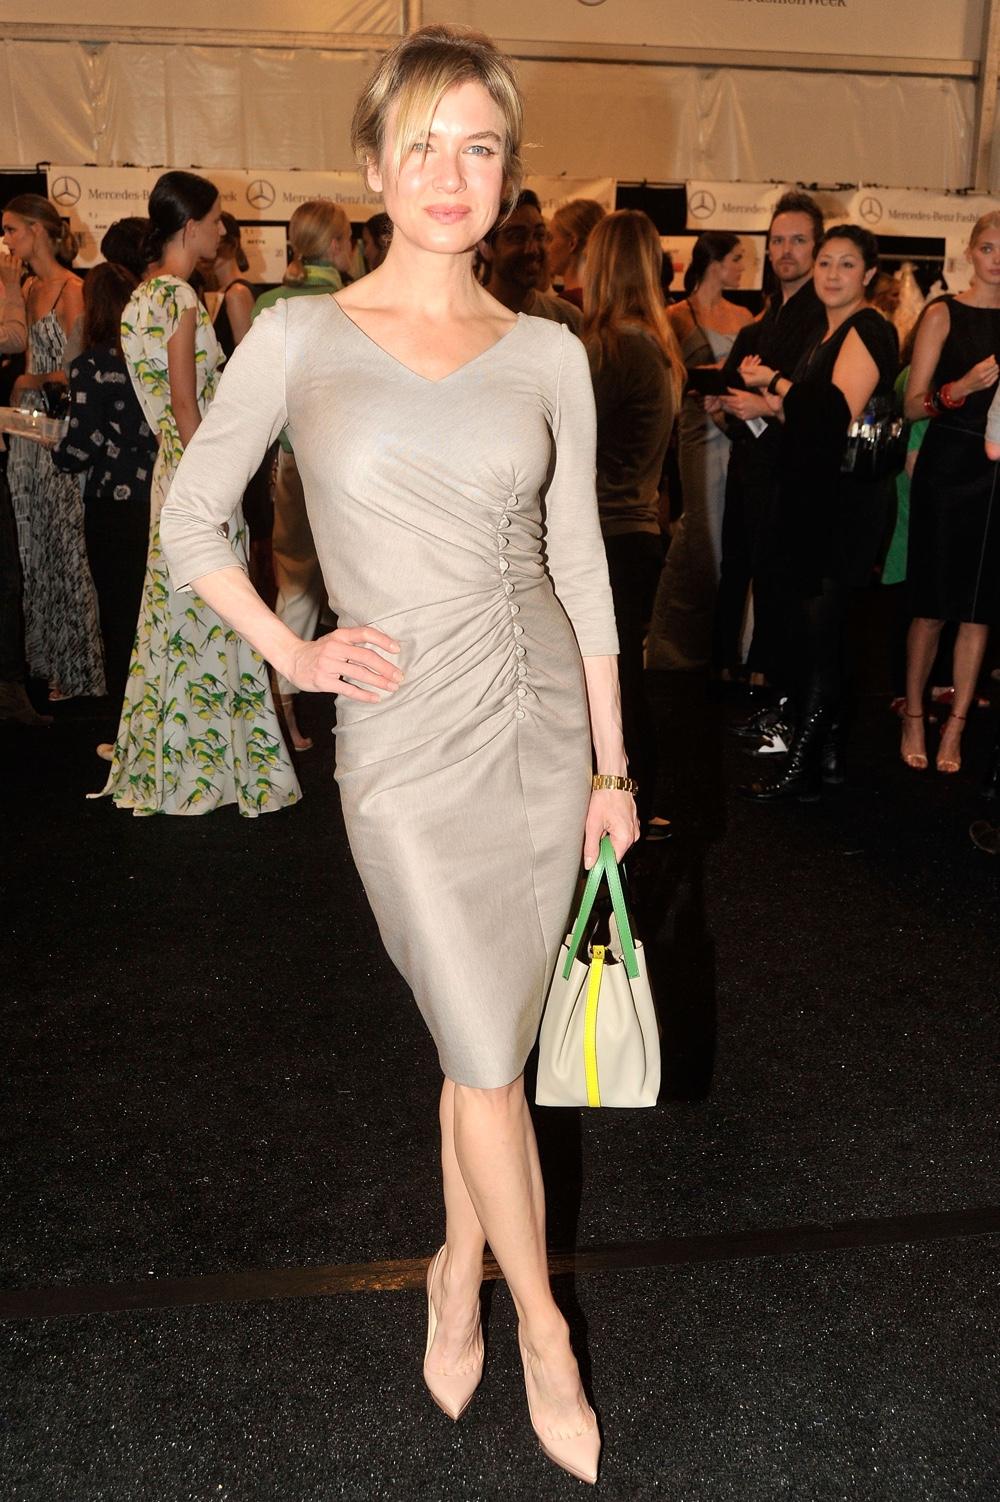 Renee Zellweger Carolina Herrera - Backstage - Spring 2012 Mercedes-Benz Fashion Week